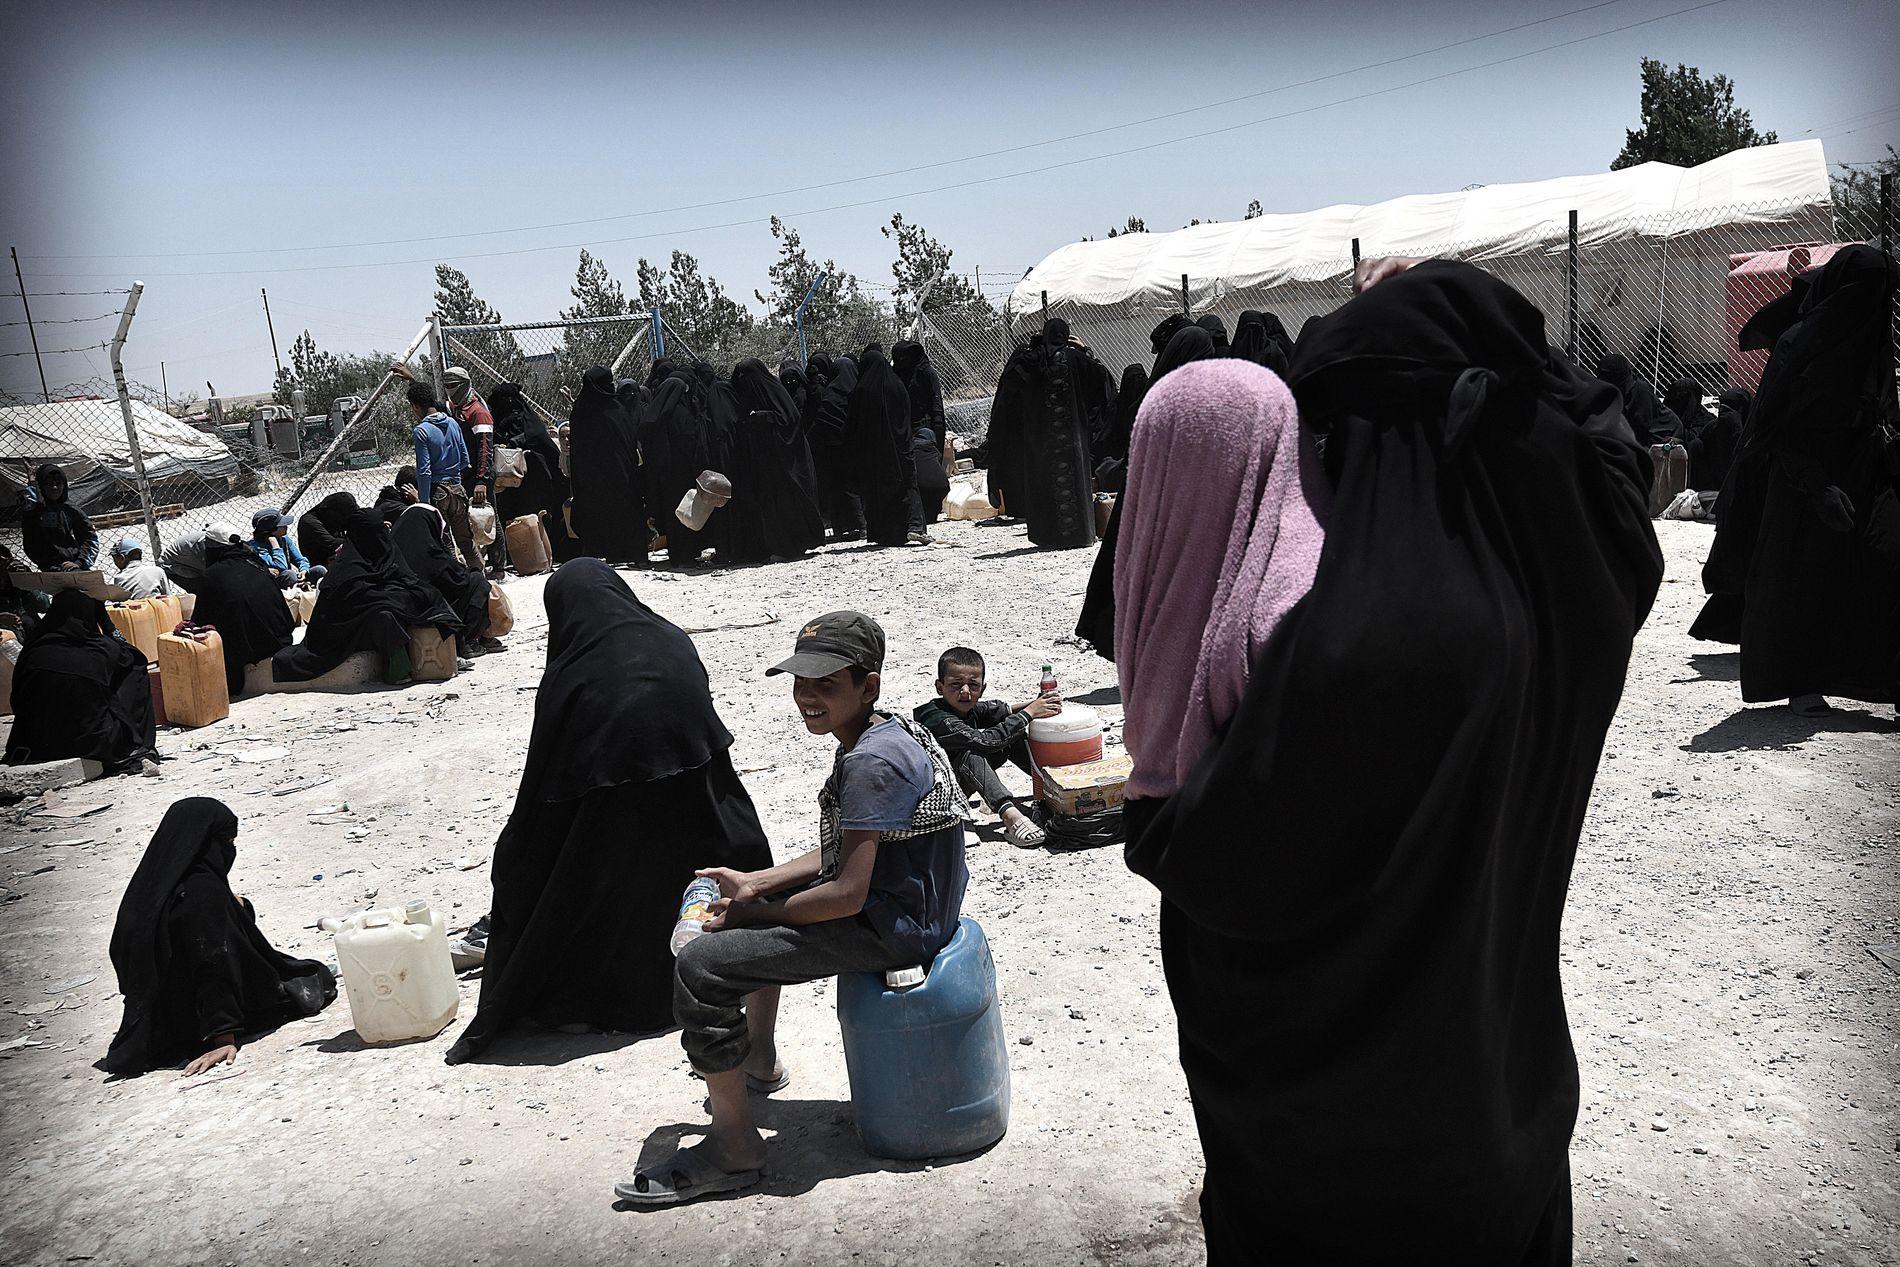 FANGER OG FLYKTNINGER: 78.000 mennesker lever under svært vanskelige forhold i al-Hol-leiren i Syria.